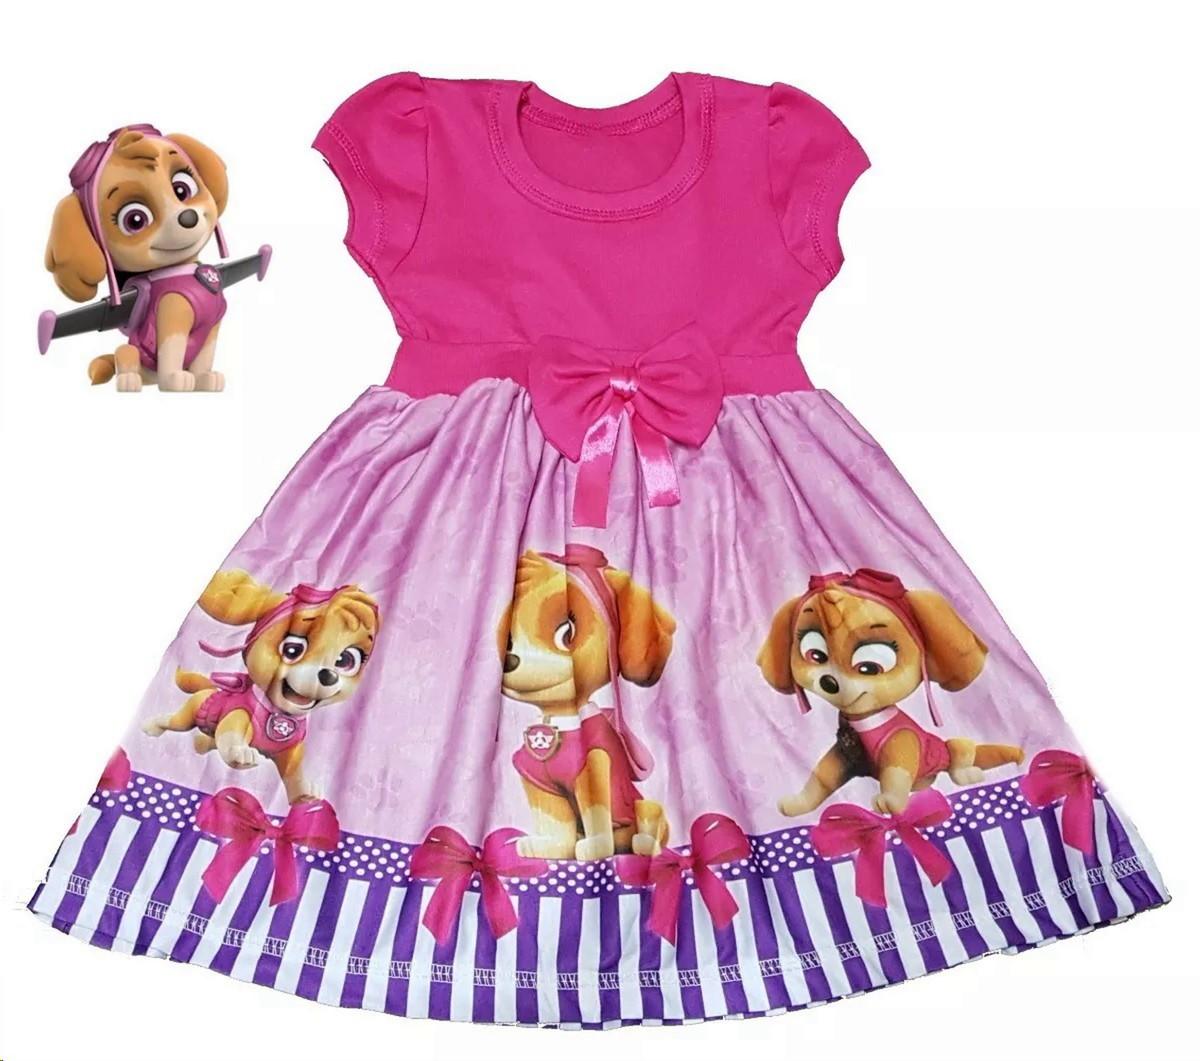 Vestido Festa Infantil Tema Patrulha Canina Rosa 4 A 5 Anos